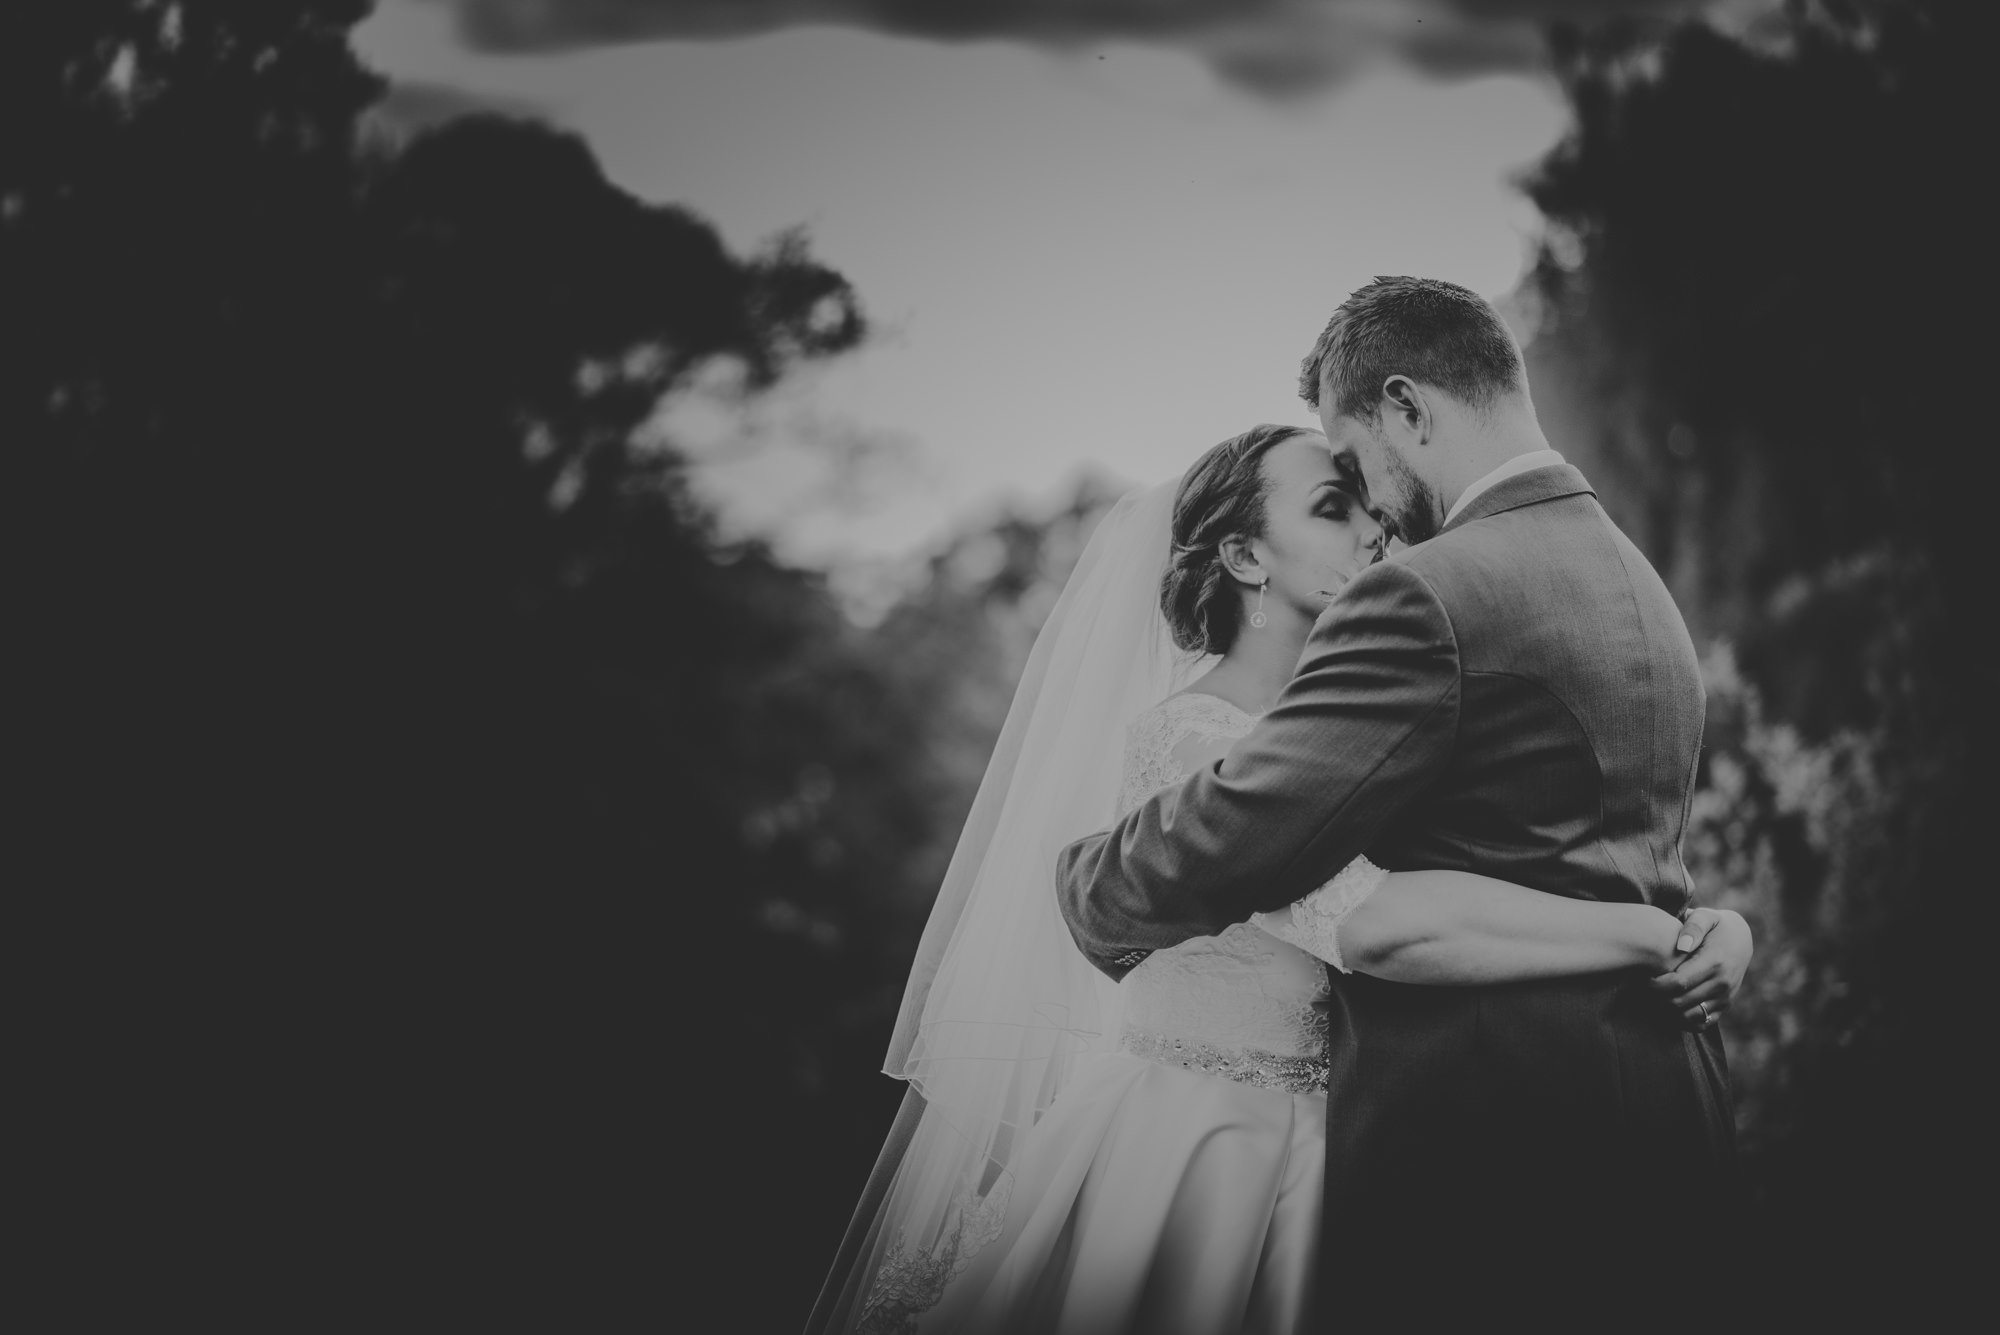 Jacqueline-Gareth-Wedding-Westmead-Events-Surrey-Manu-Mendoza-Wedding-Photography-484.jpg